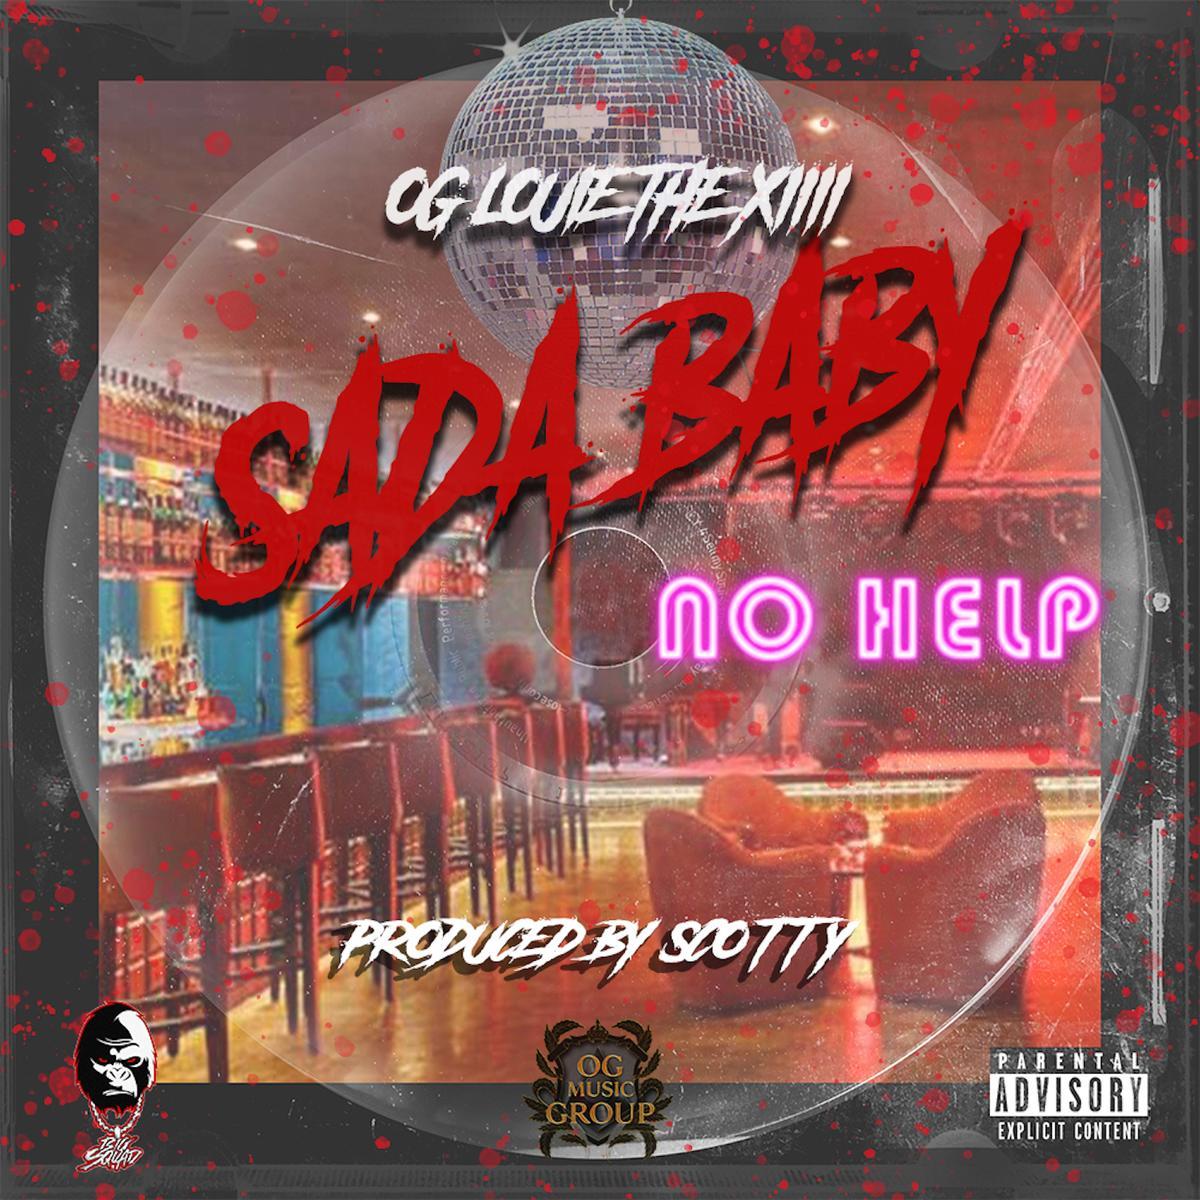 MP3: Sada Baby & OG Louie The XIII - No Help